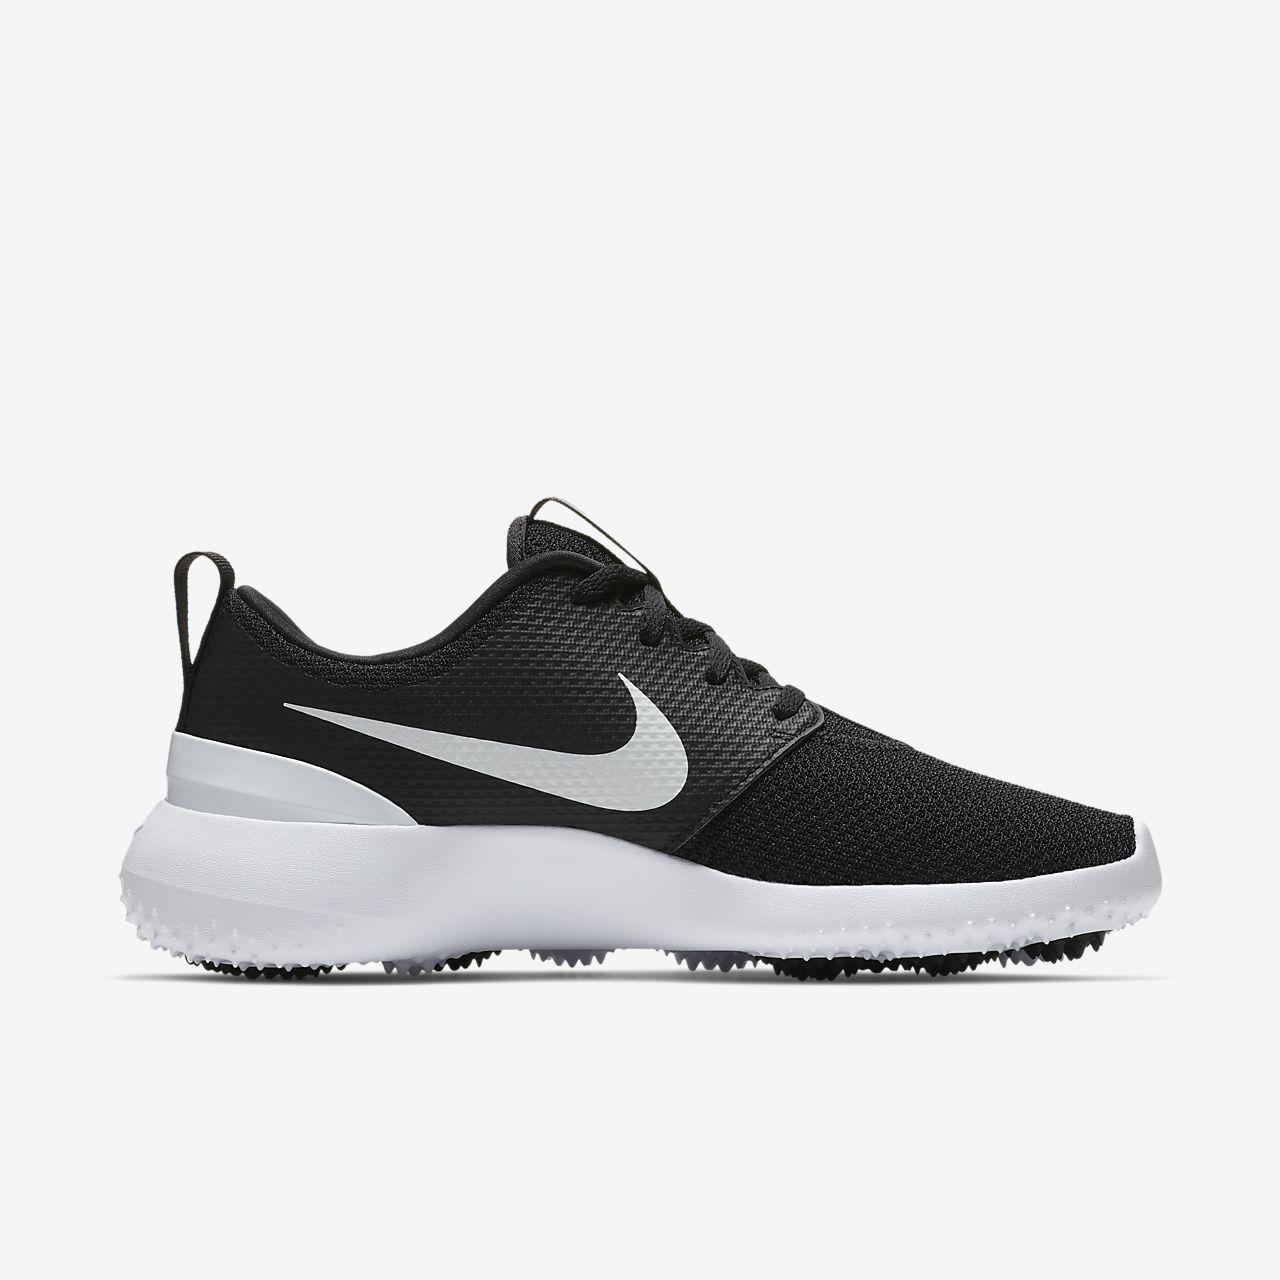 b94b7023ab49 Nike Roshe G Women s Golf Shoe. Nike.com CA